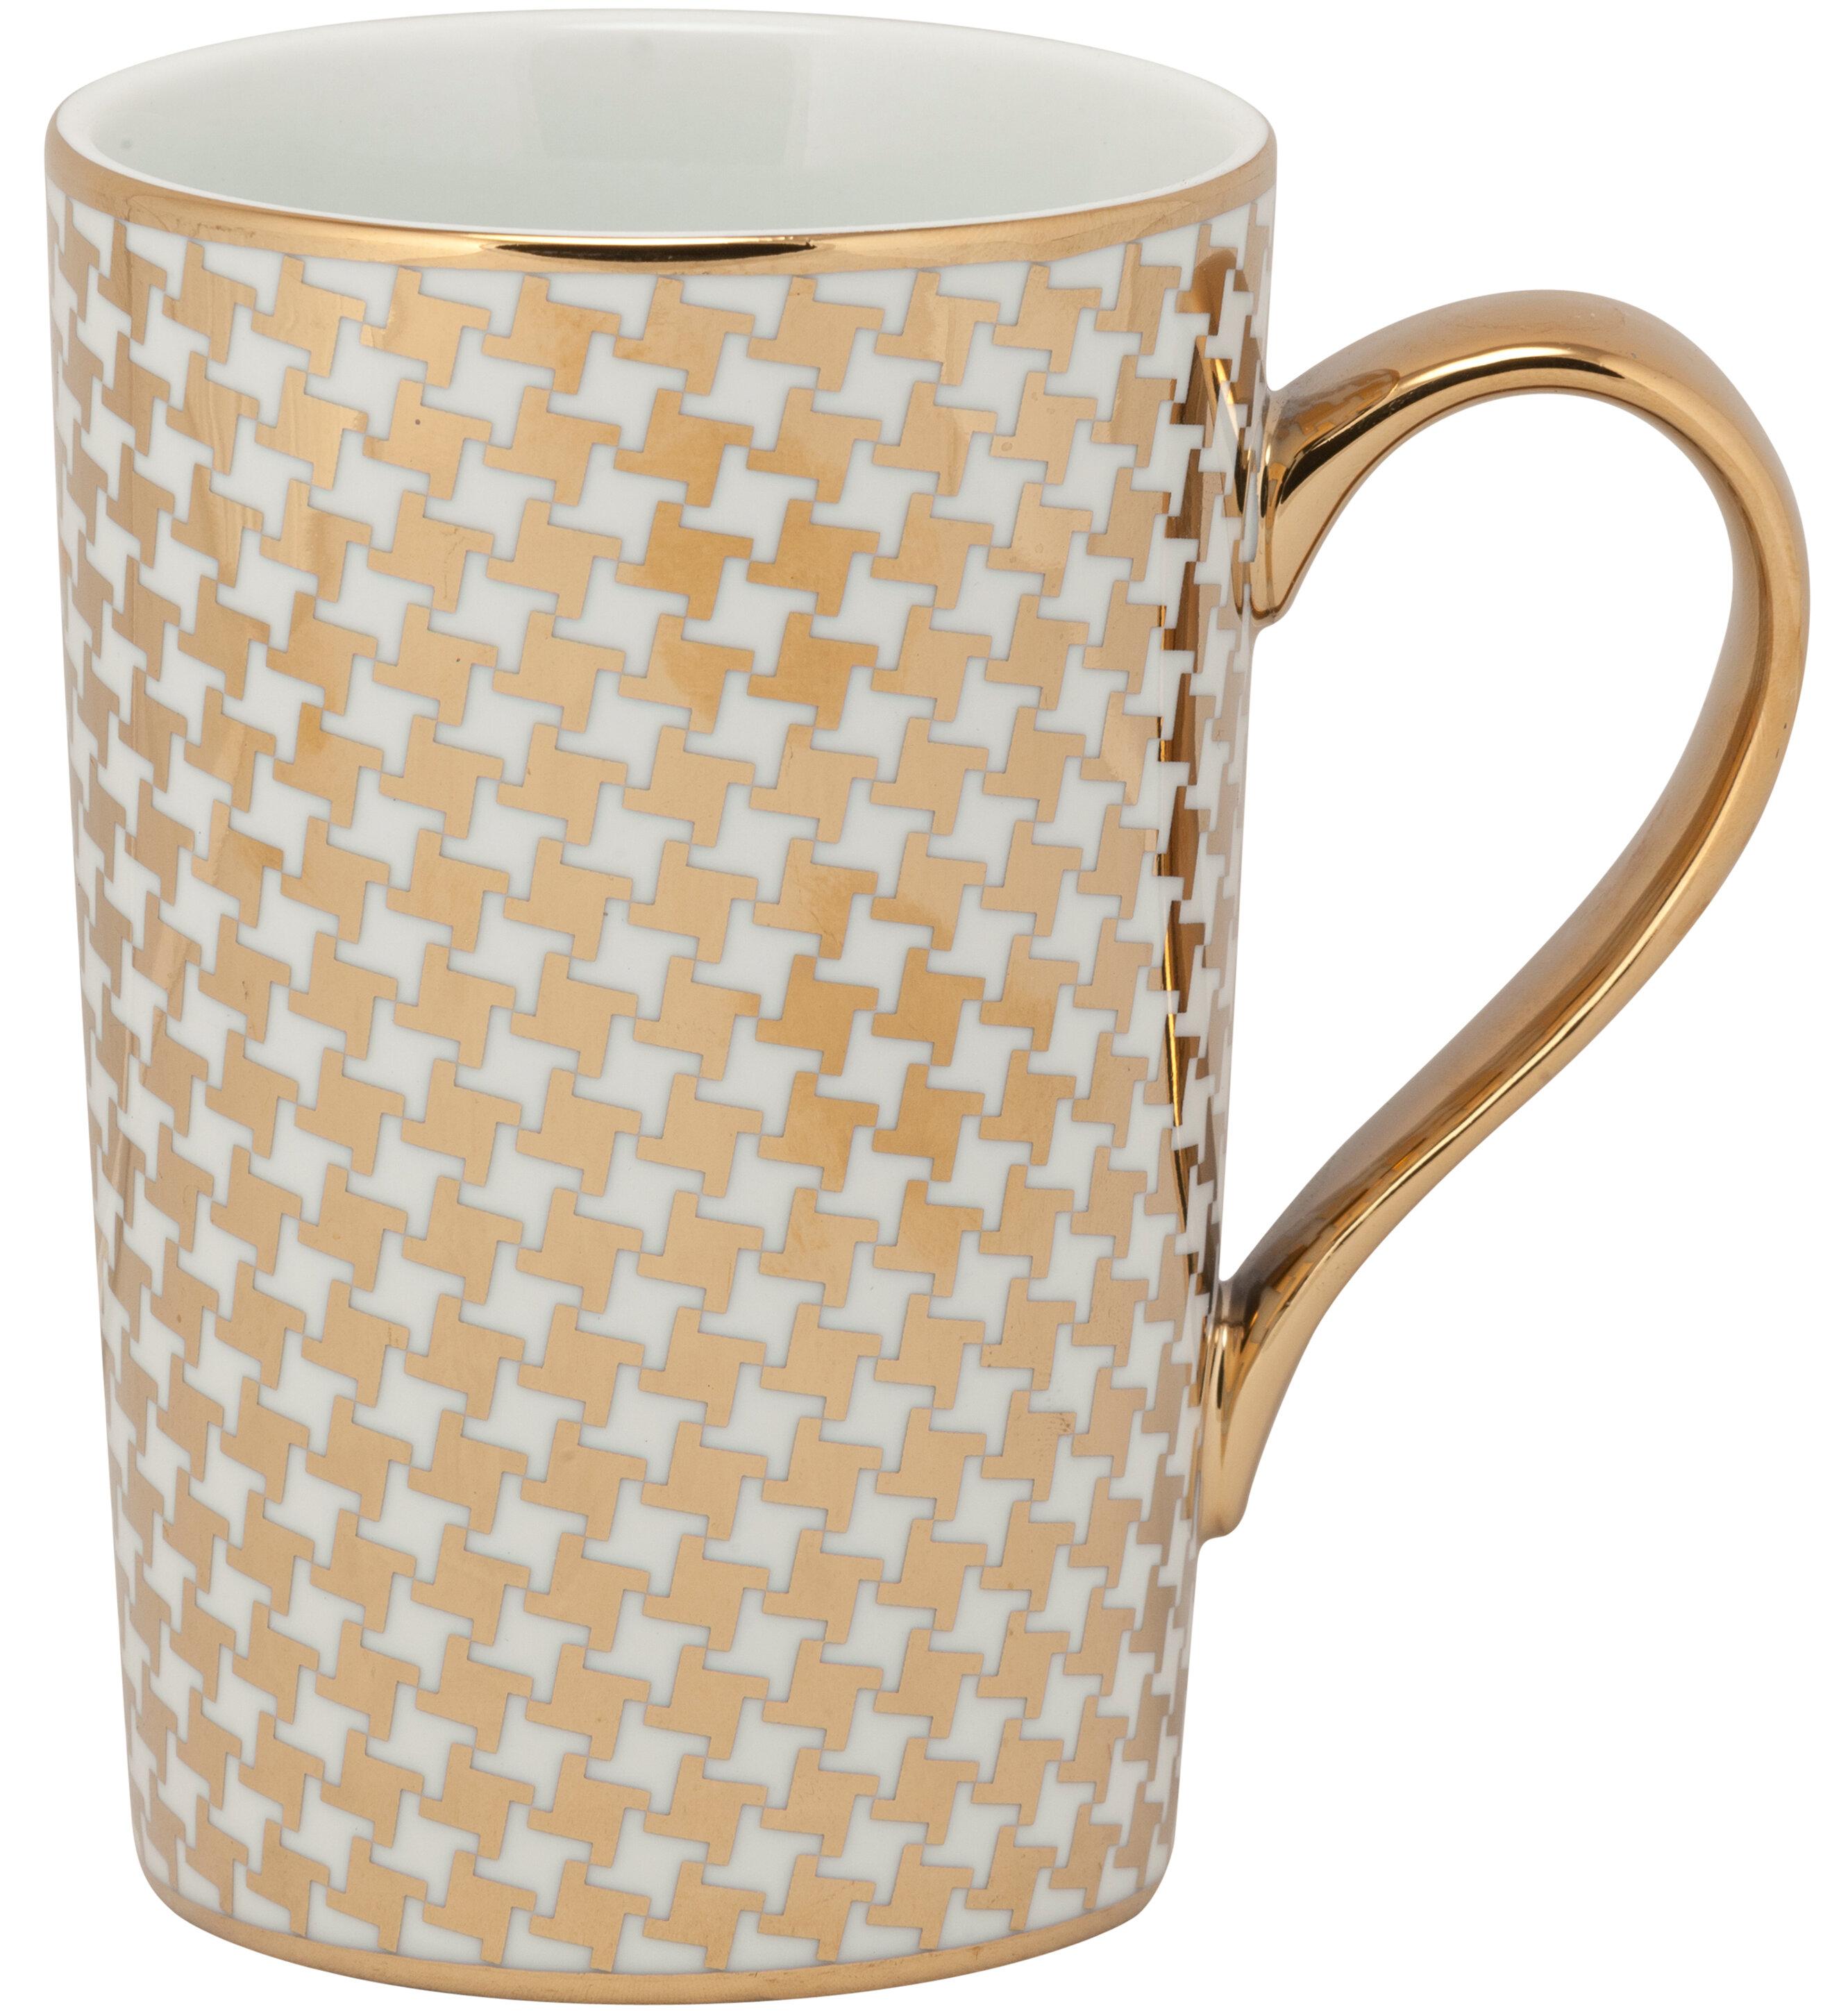 Latitude Run Noe Houndstooth Mug | Wayfair